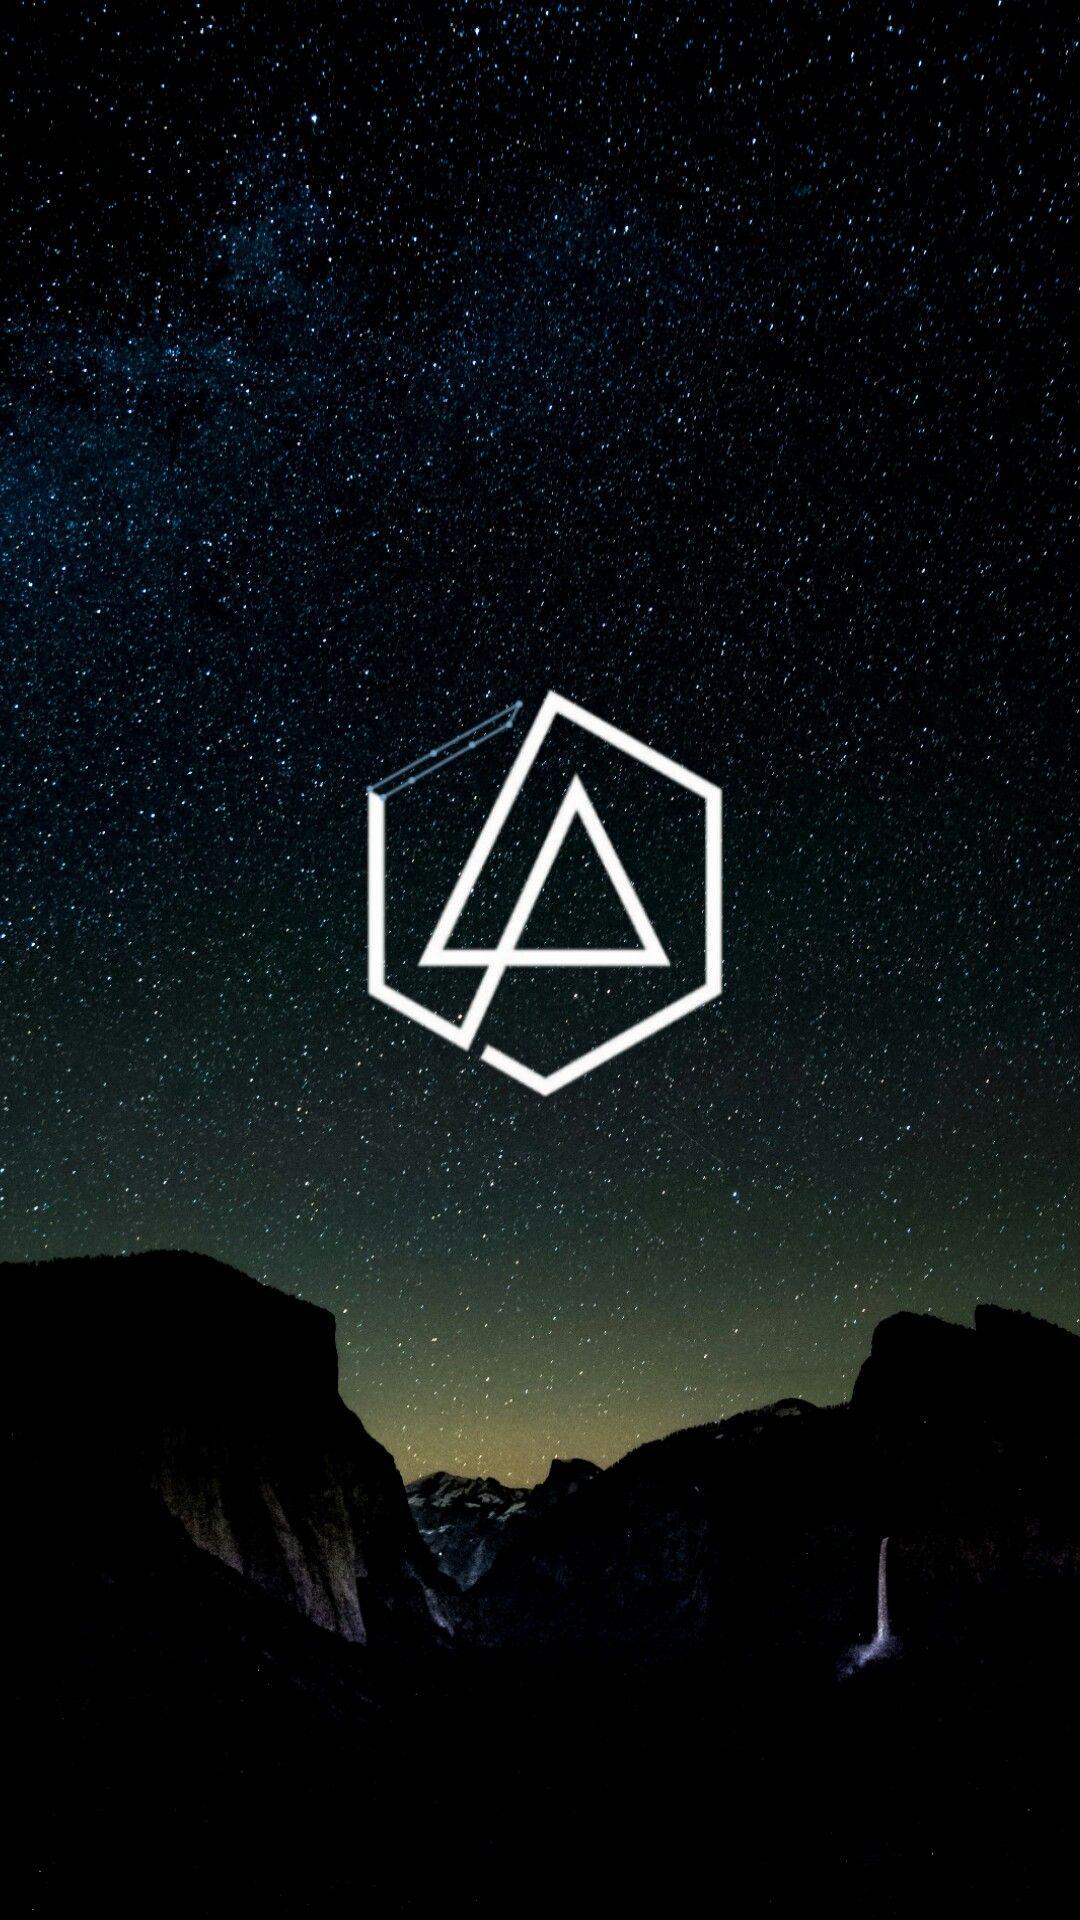 Linkin Park Background Linkin Park Logo Papel De Parede Do Iphone Papel De Parede De Astronauta